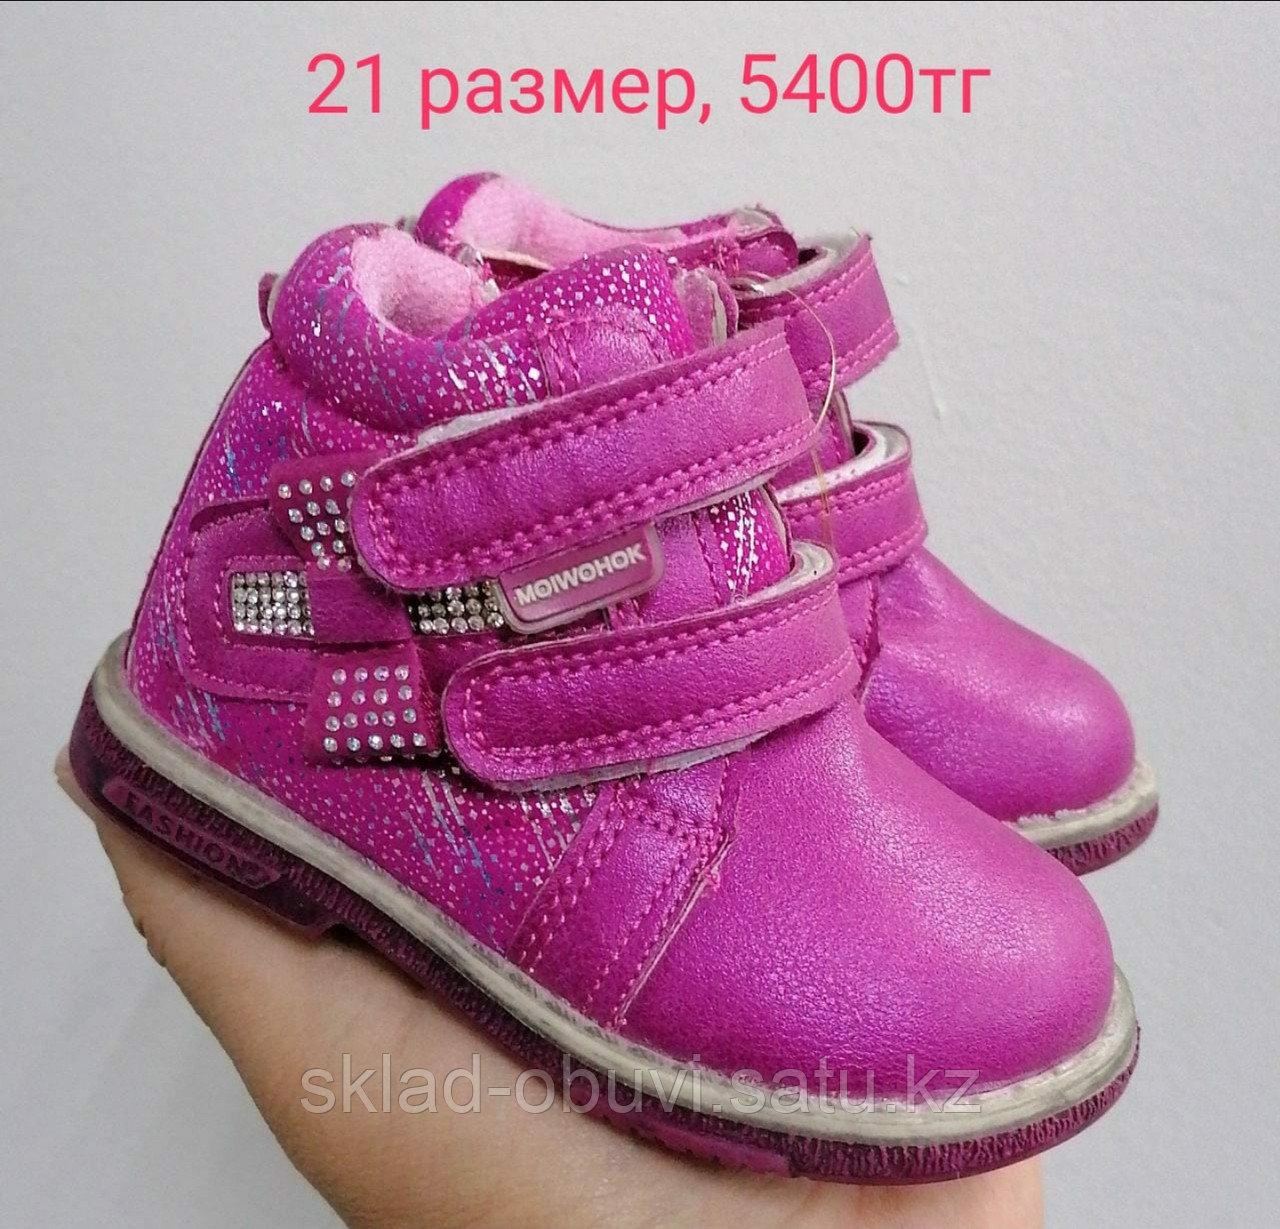 Flamingo. Ботинки детям. - фото 6